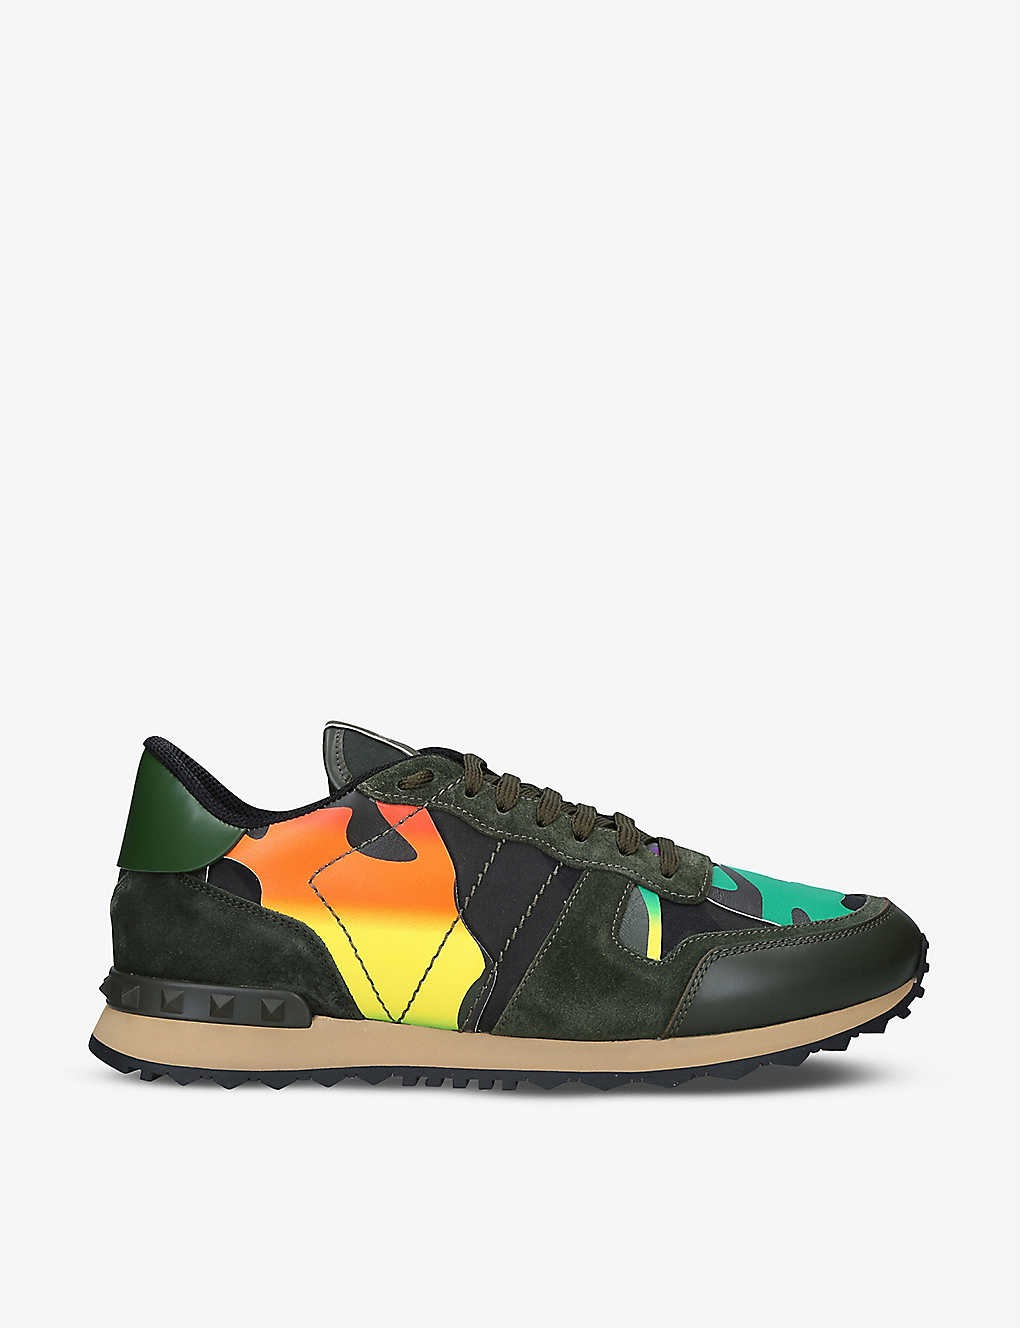 Valentino Garavini Rock Runner Suede and Leather Sneakers -Best Designer Sneakers